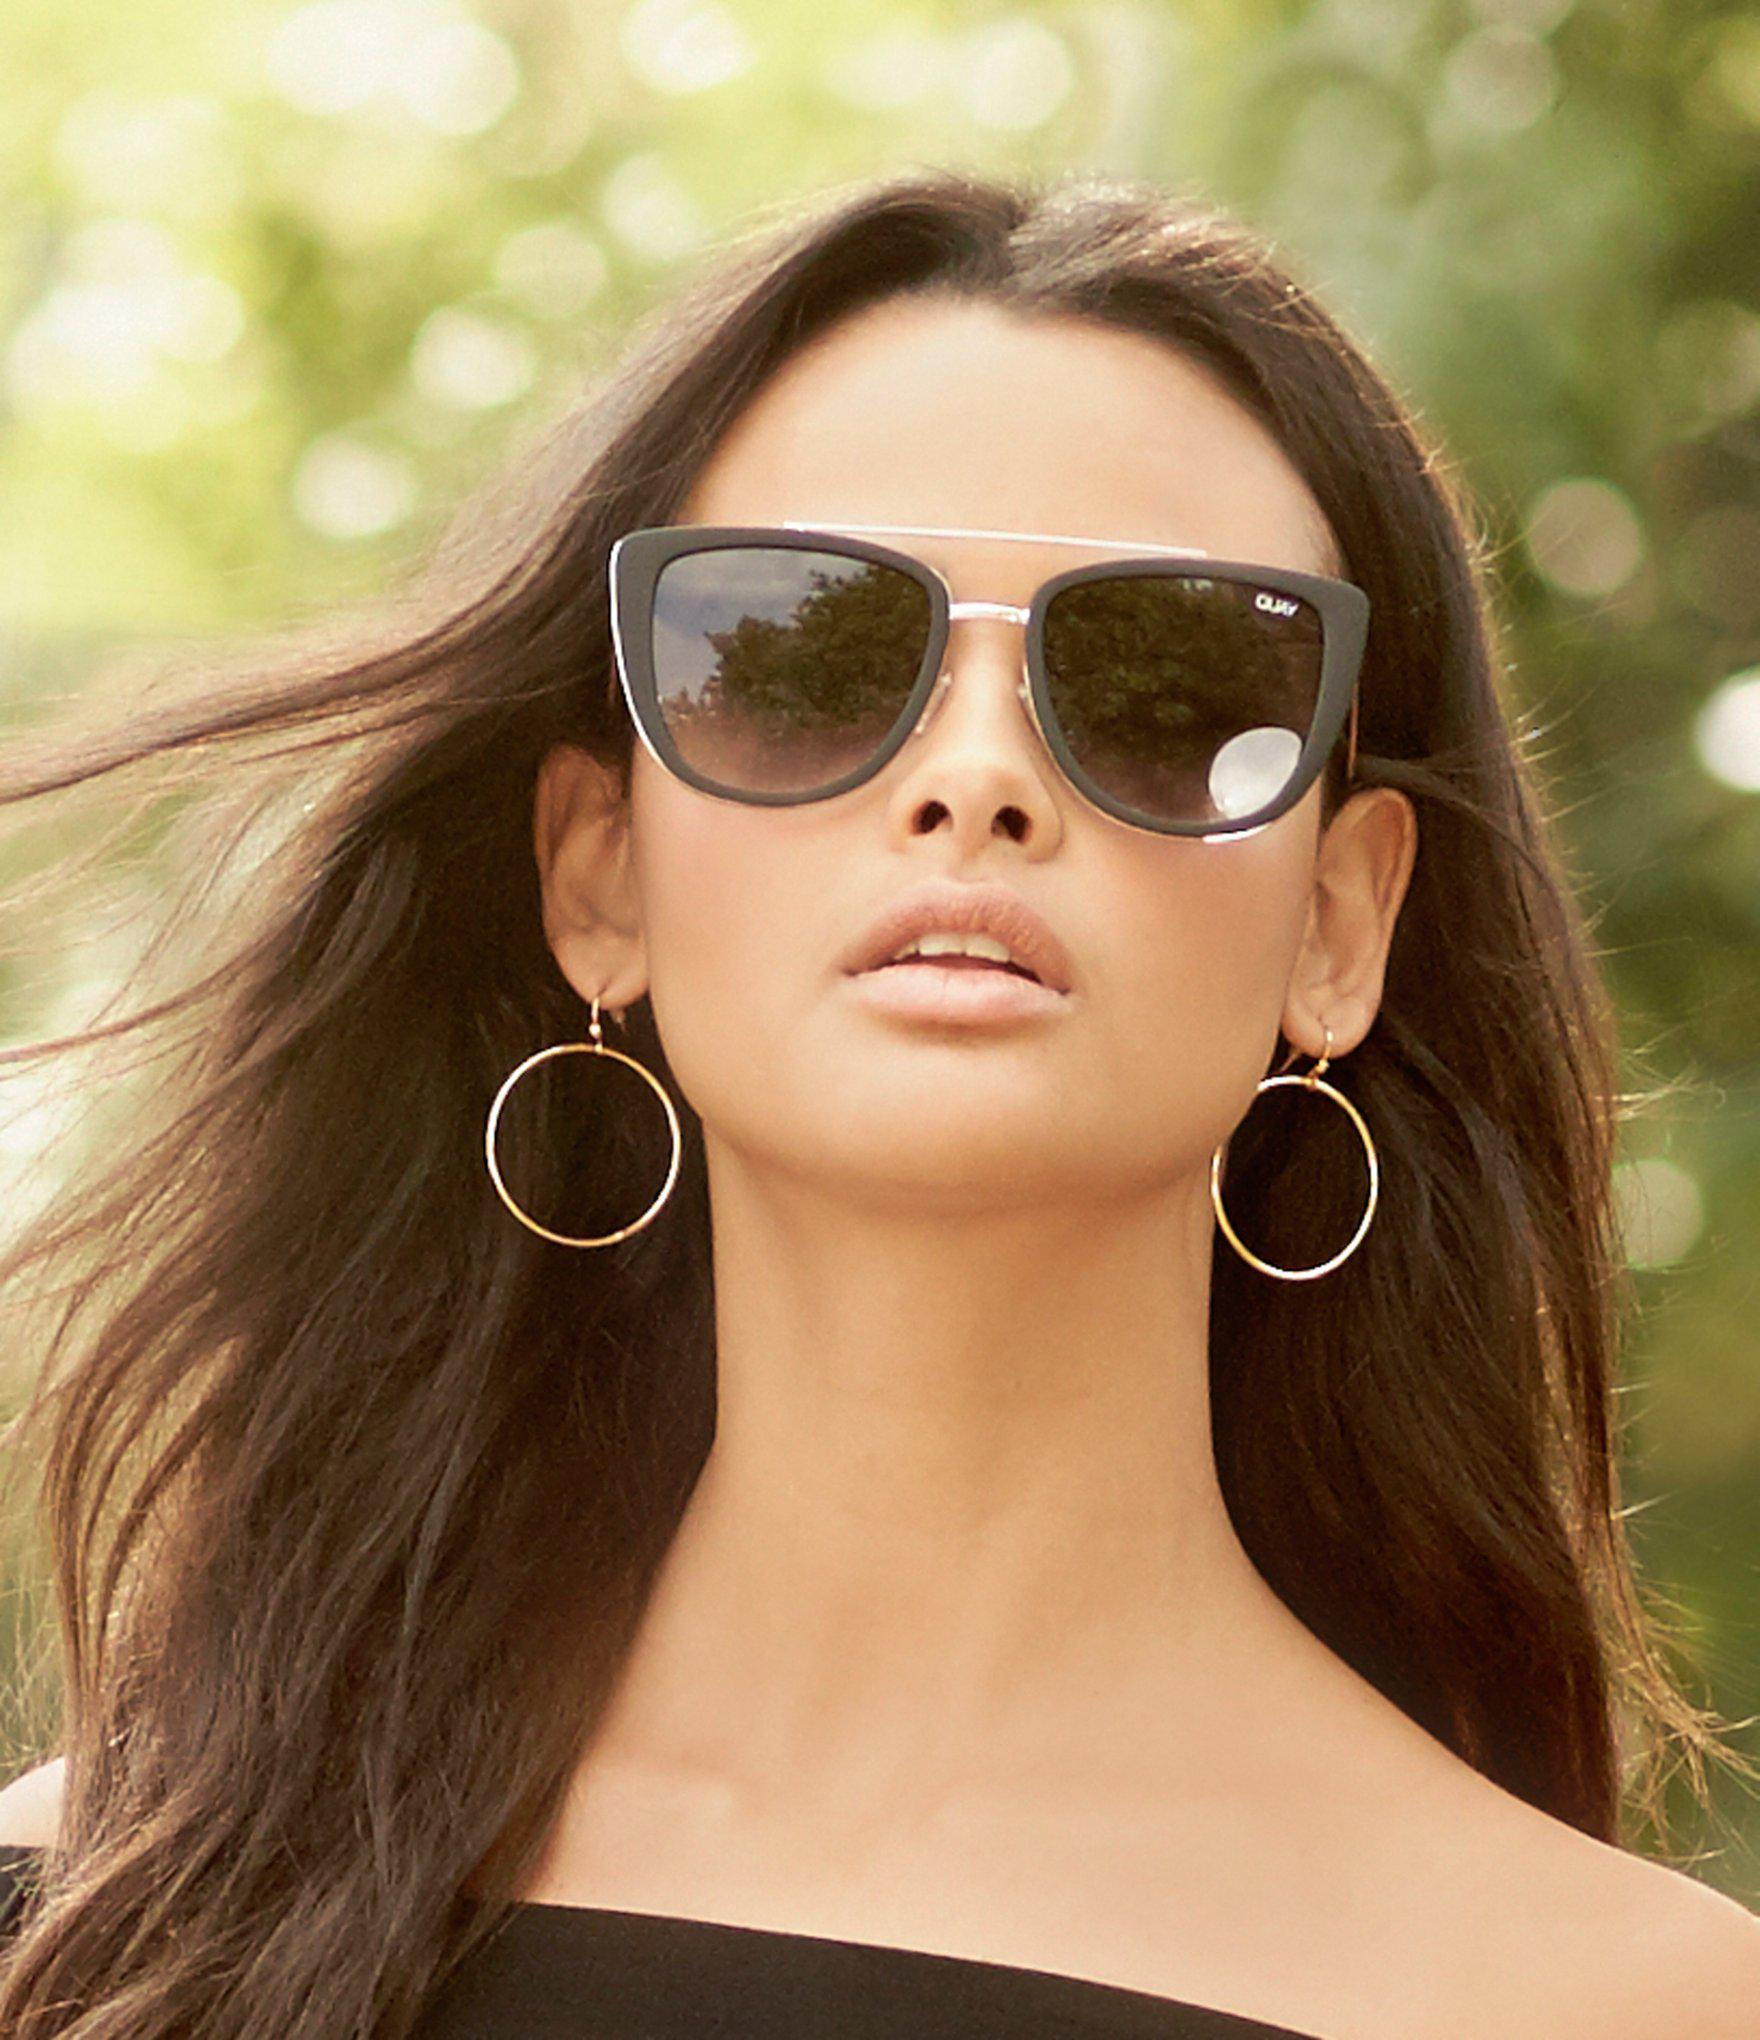 0faec1ec101 Quay - Black French Kiss Cat-eye Sunglasses - Lyst. View fullscreen